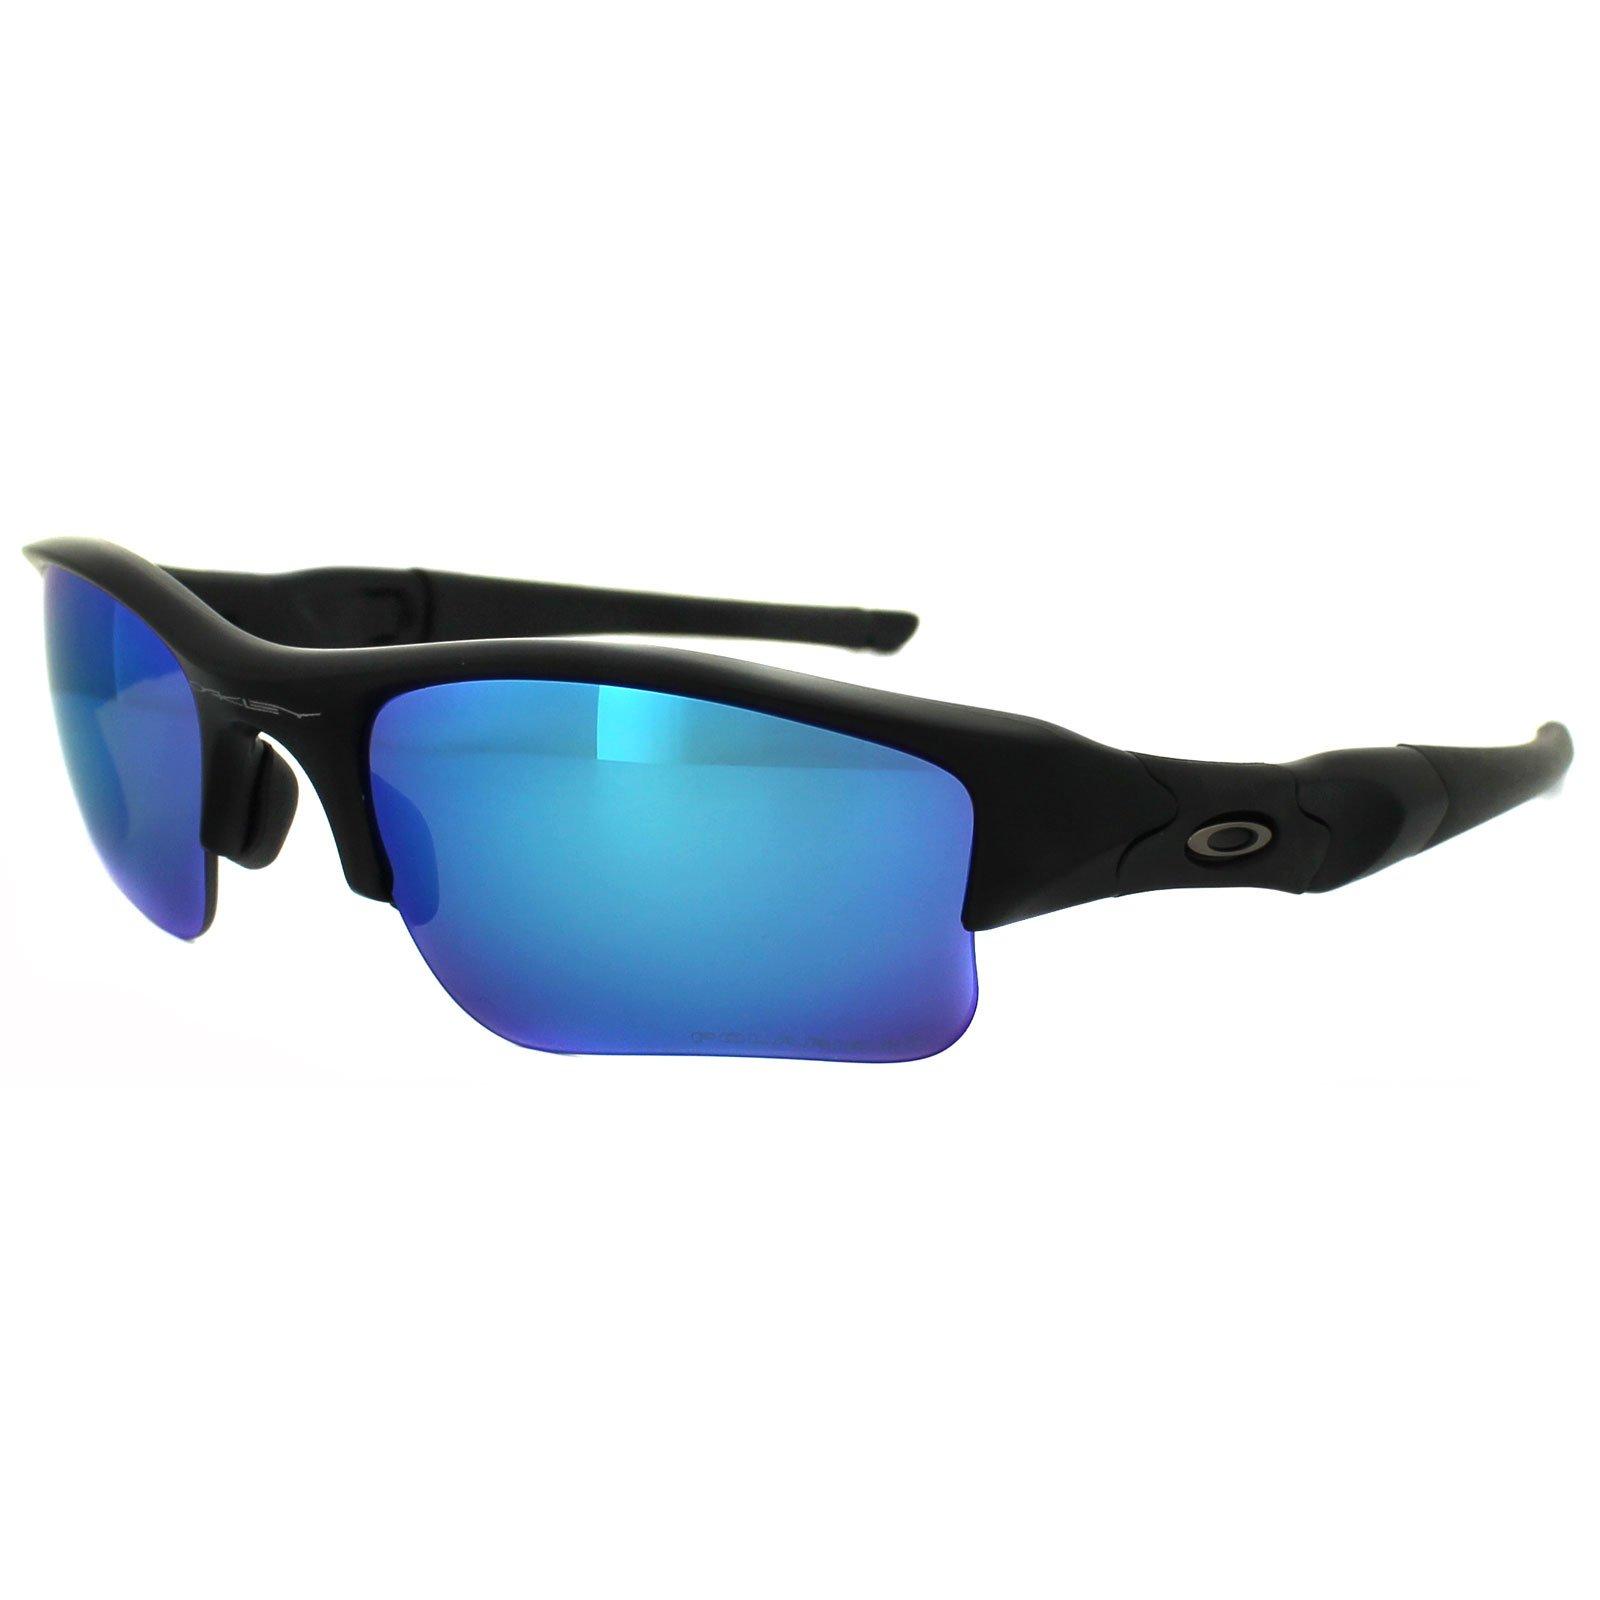 Oakley MPH Flak Jacket Sunglasses